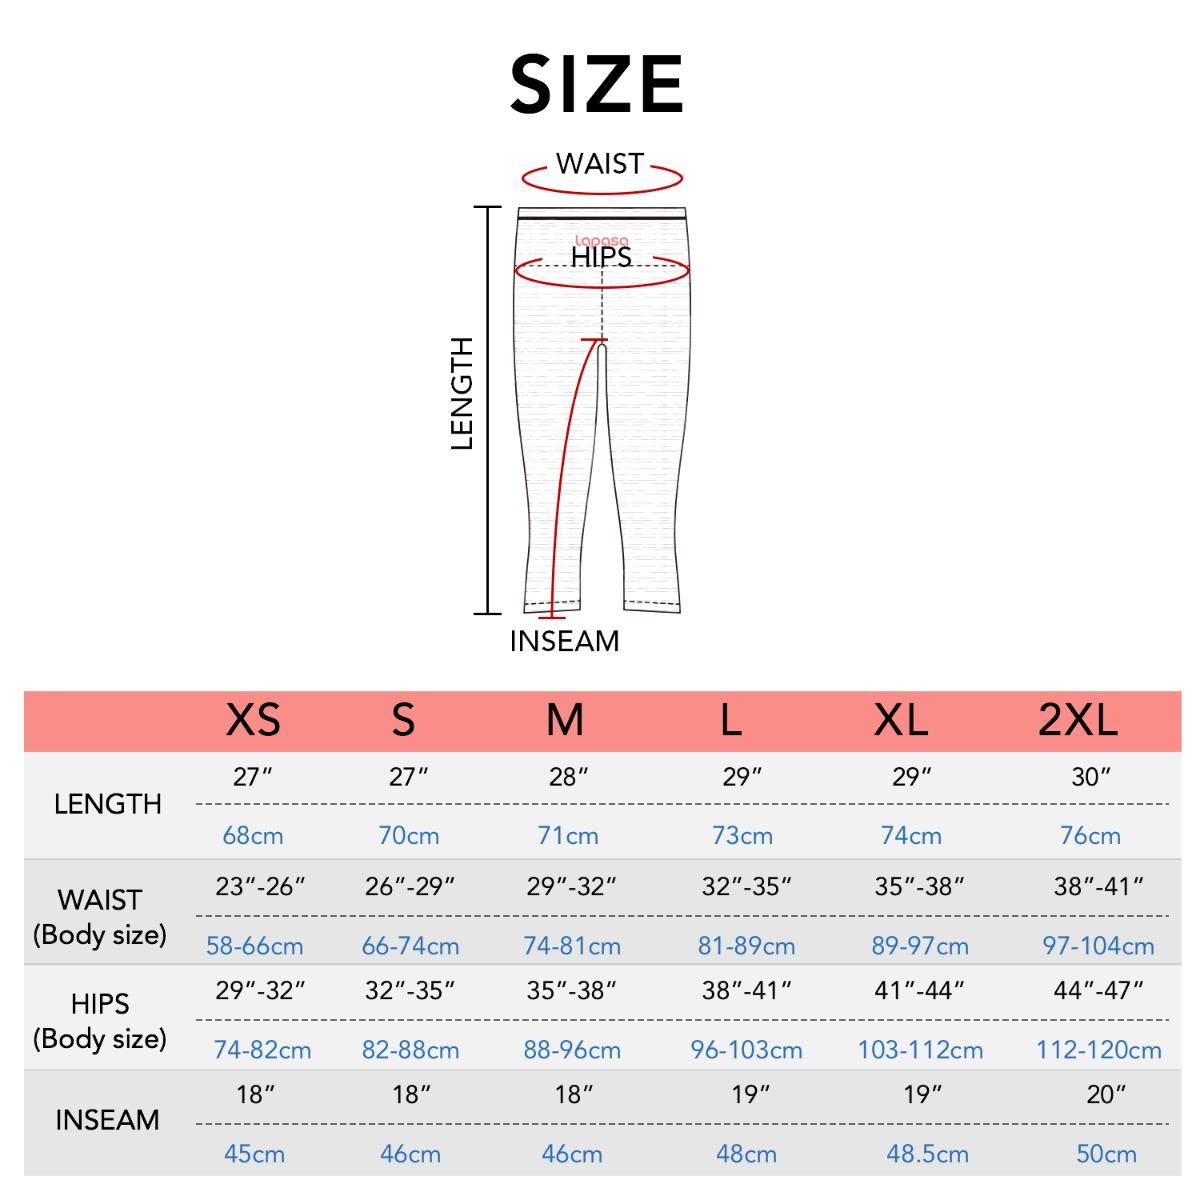 L33 size chart